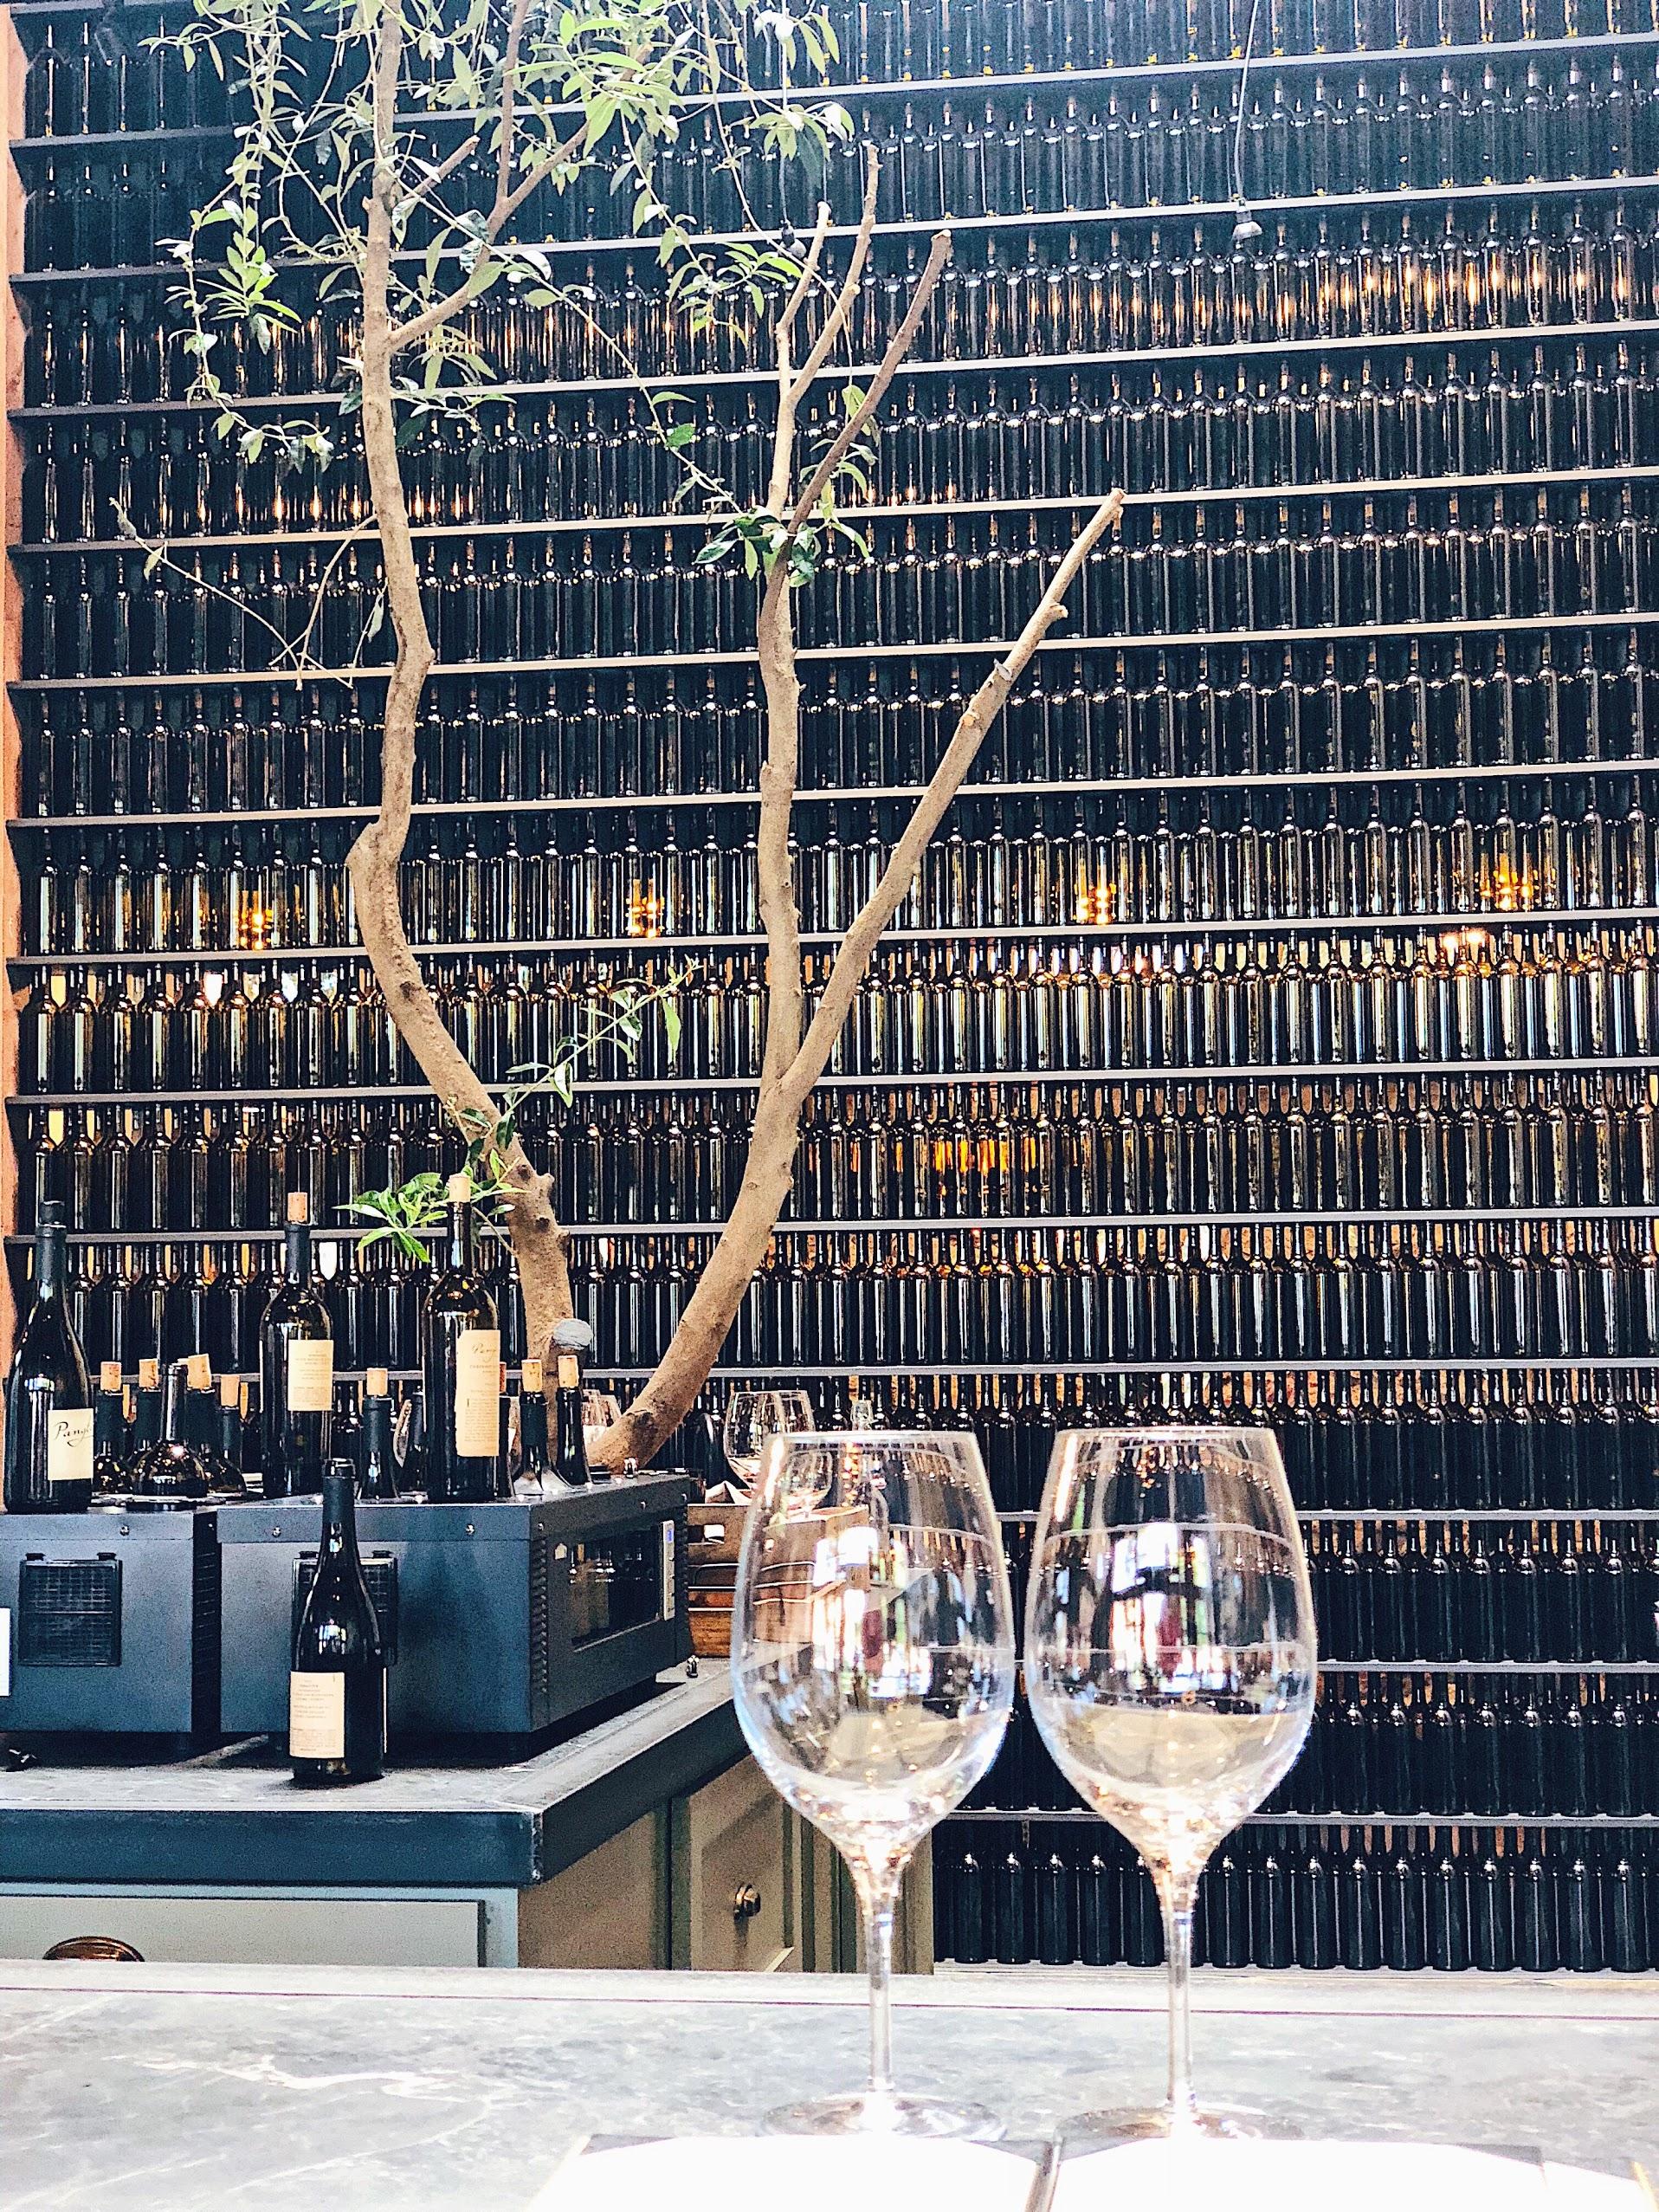 Wine Bottle Wall At Pangloss Cellars